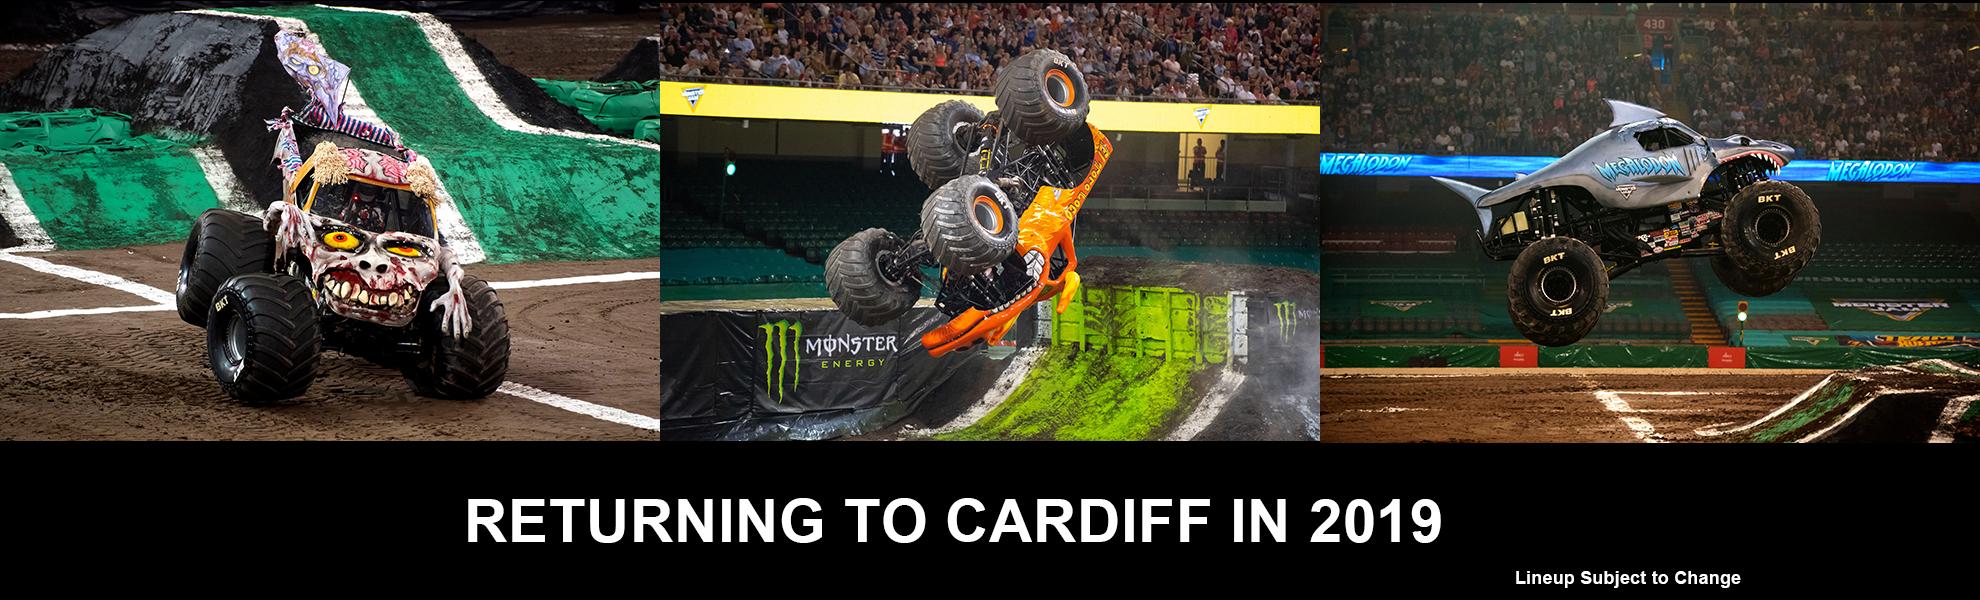 Cardiff1